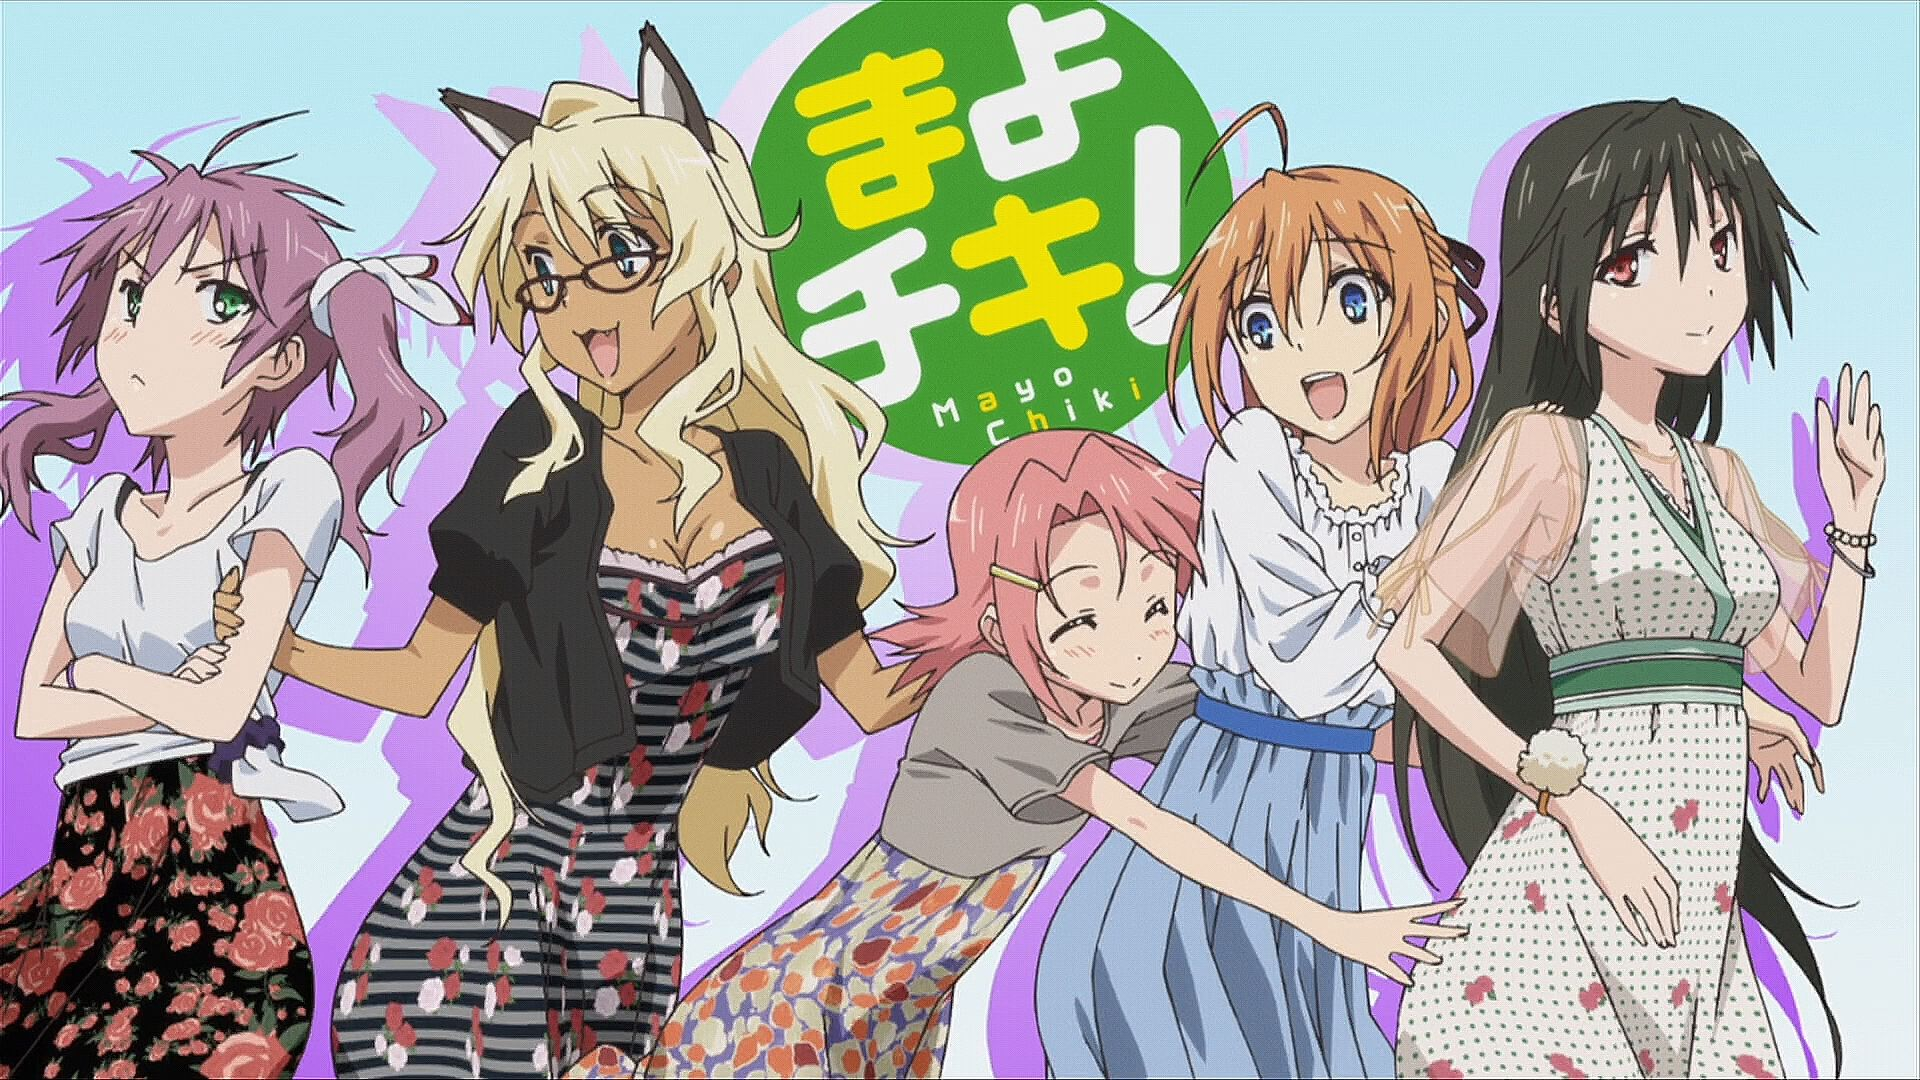 Mayo chiki mayo chiki anime shows anime films school rating film recommendations